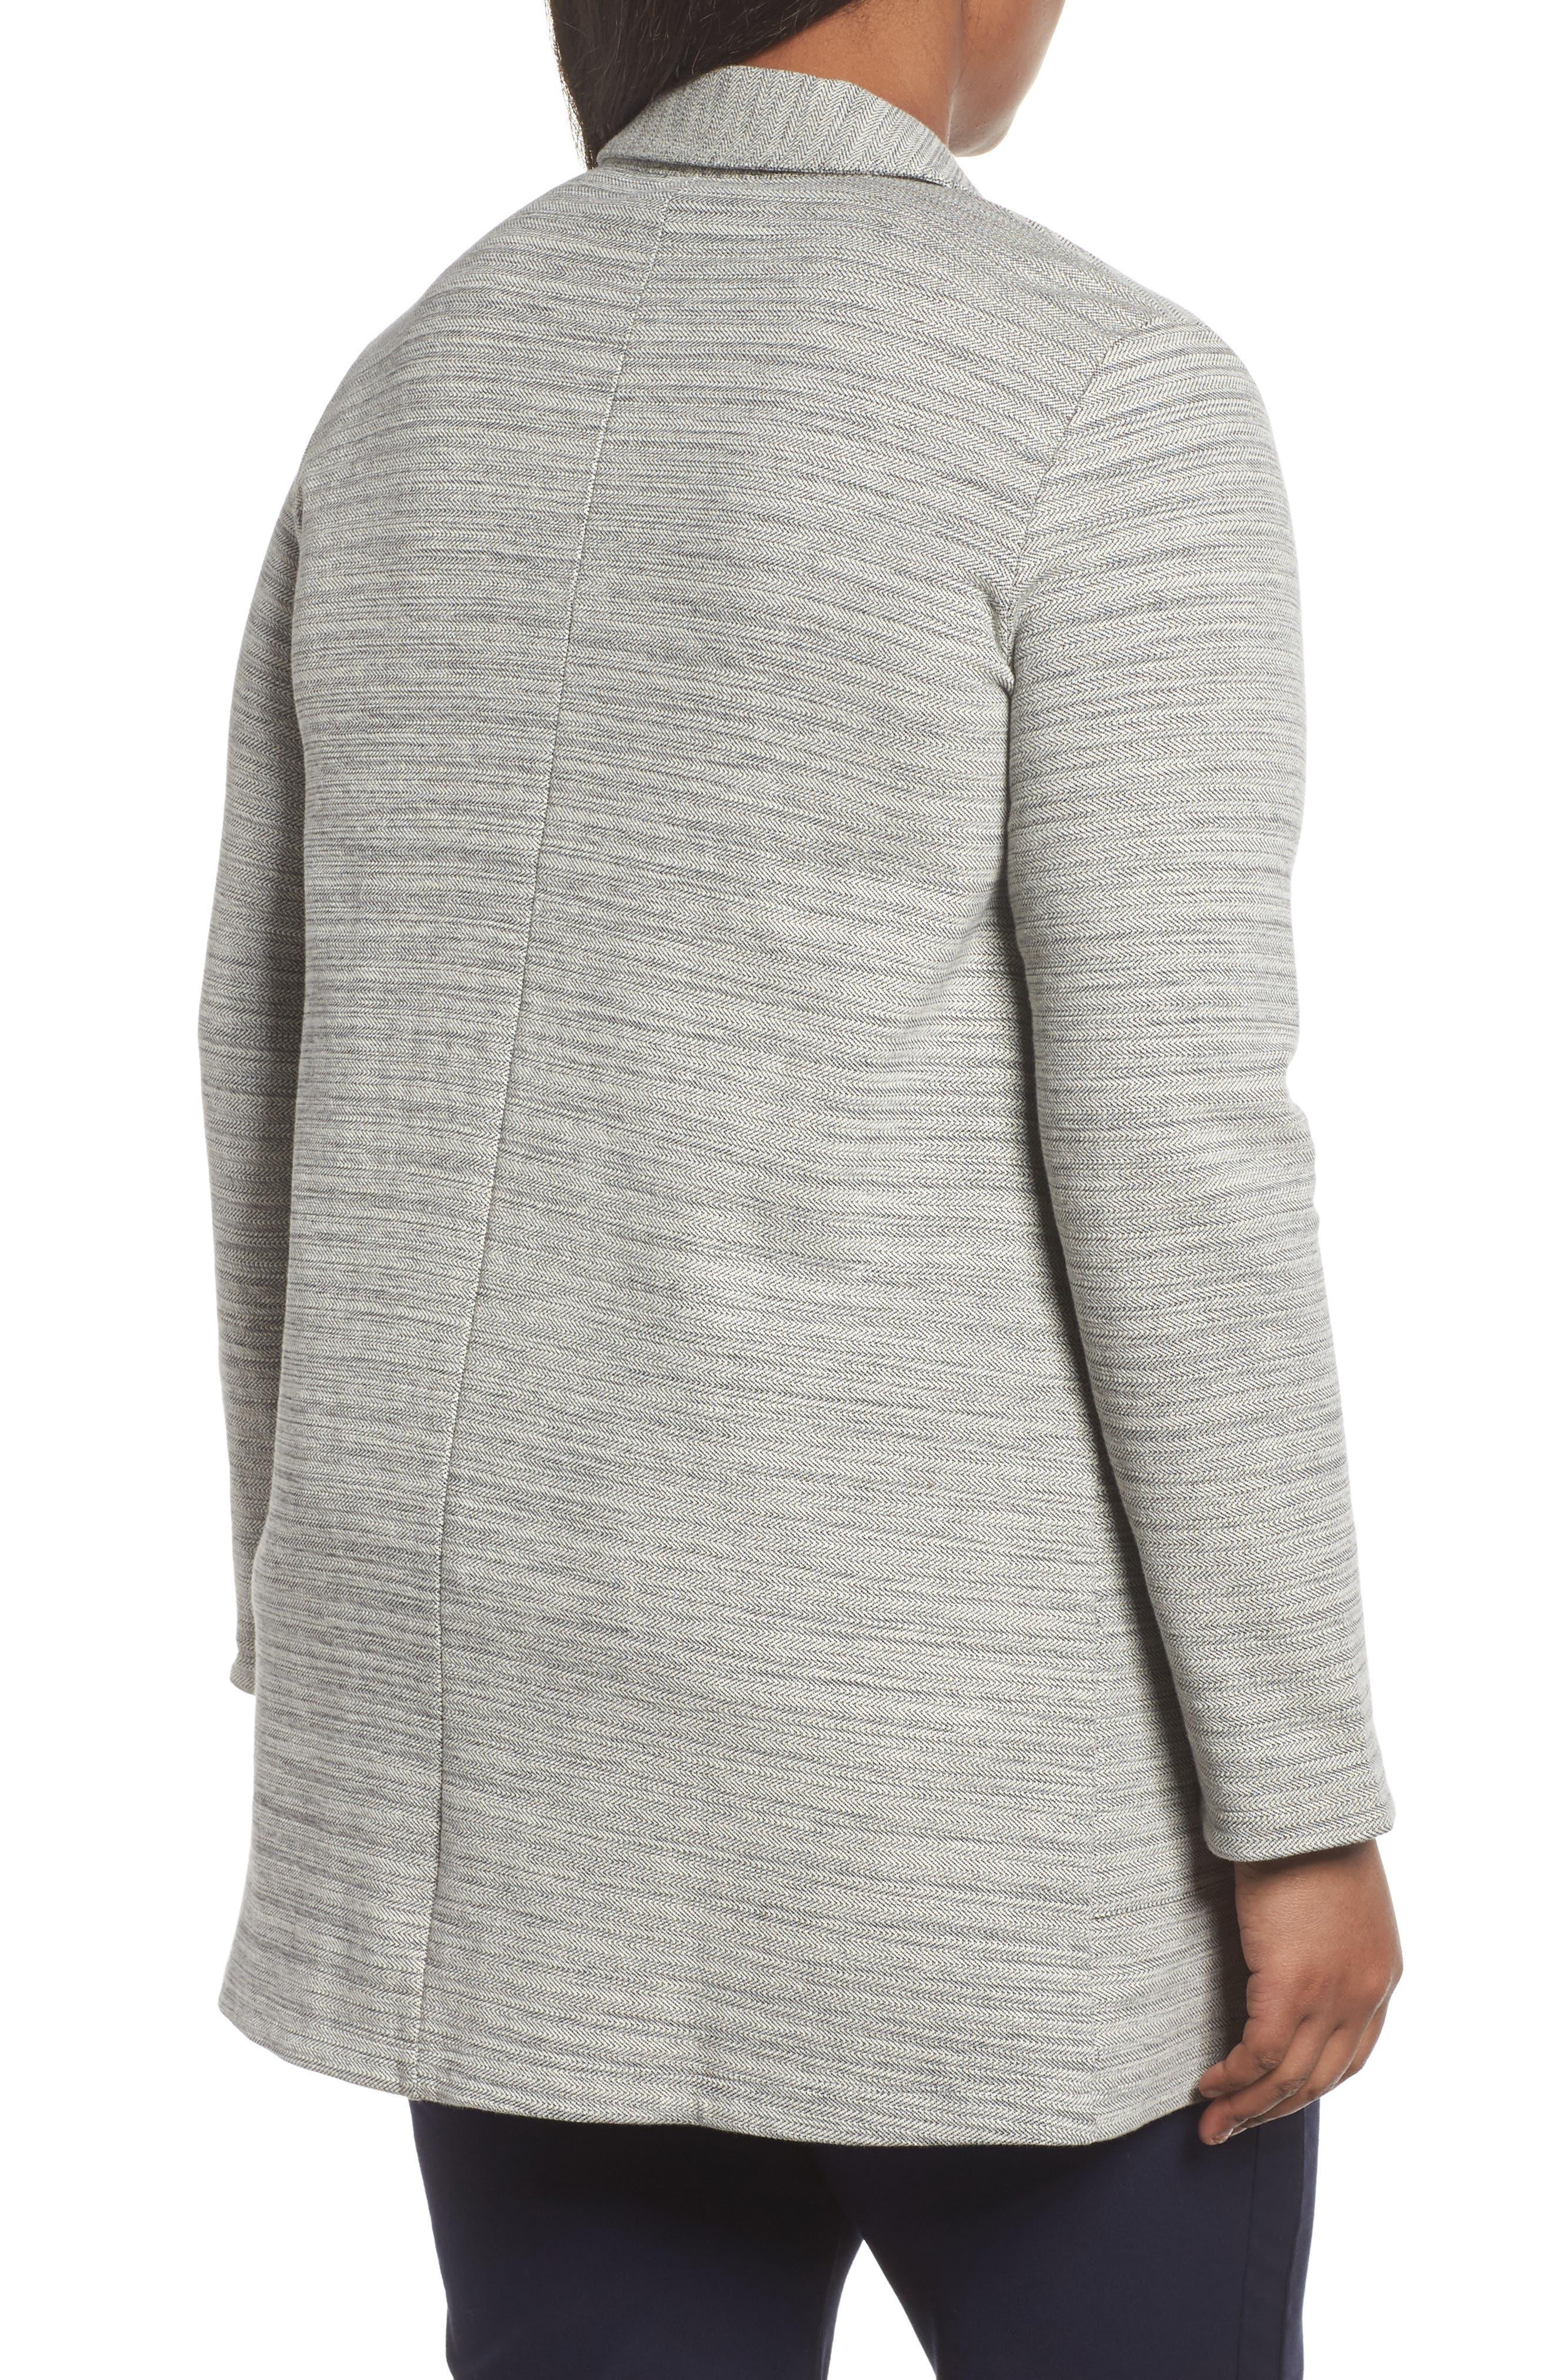 Cotton Blend Tweed Jacket,                             Alternate thumbnail 2, color,                             022